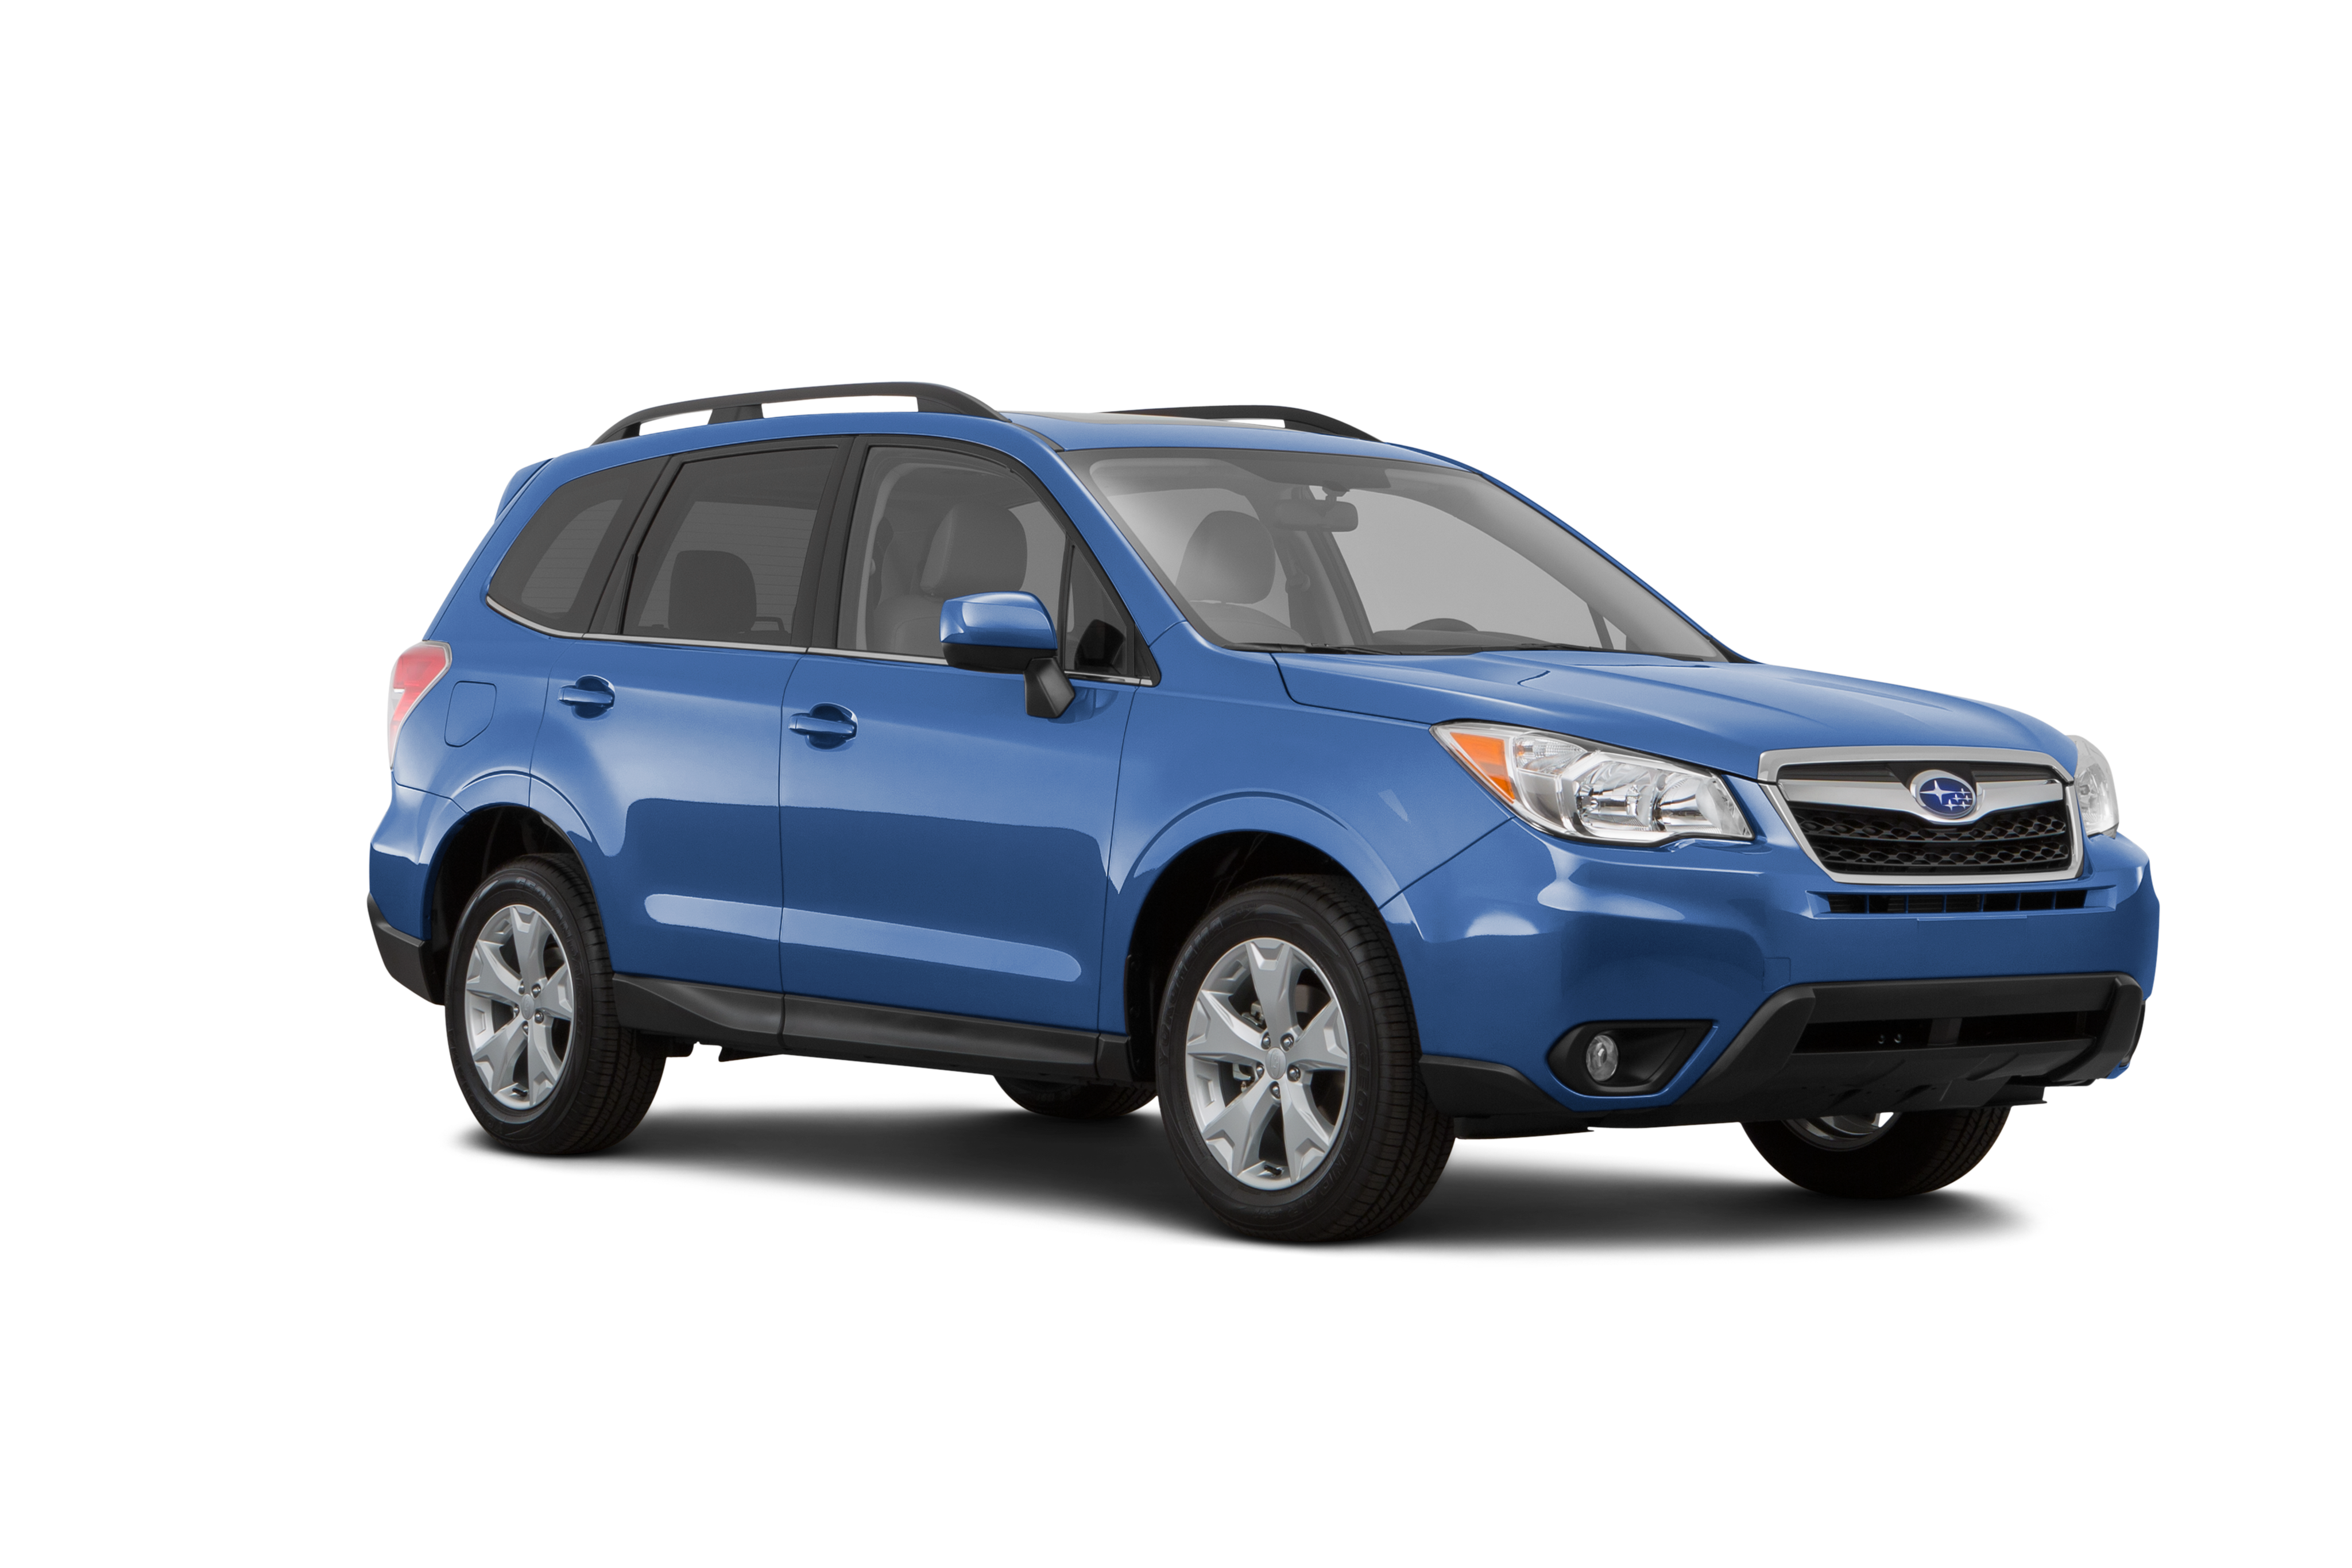 Subaru Dealer Near Me >> Wallingford Area Subaru Dealer Near Me At Premier Subaru Subaru